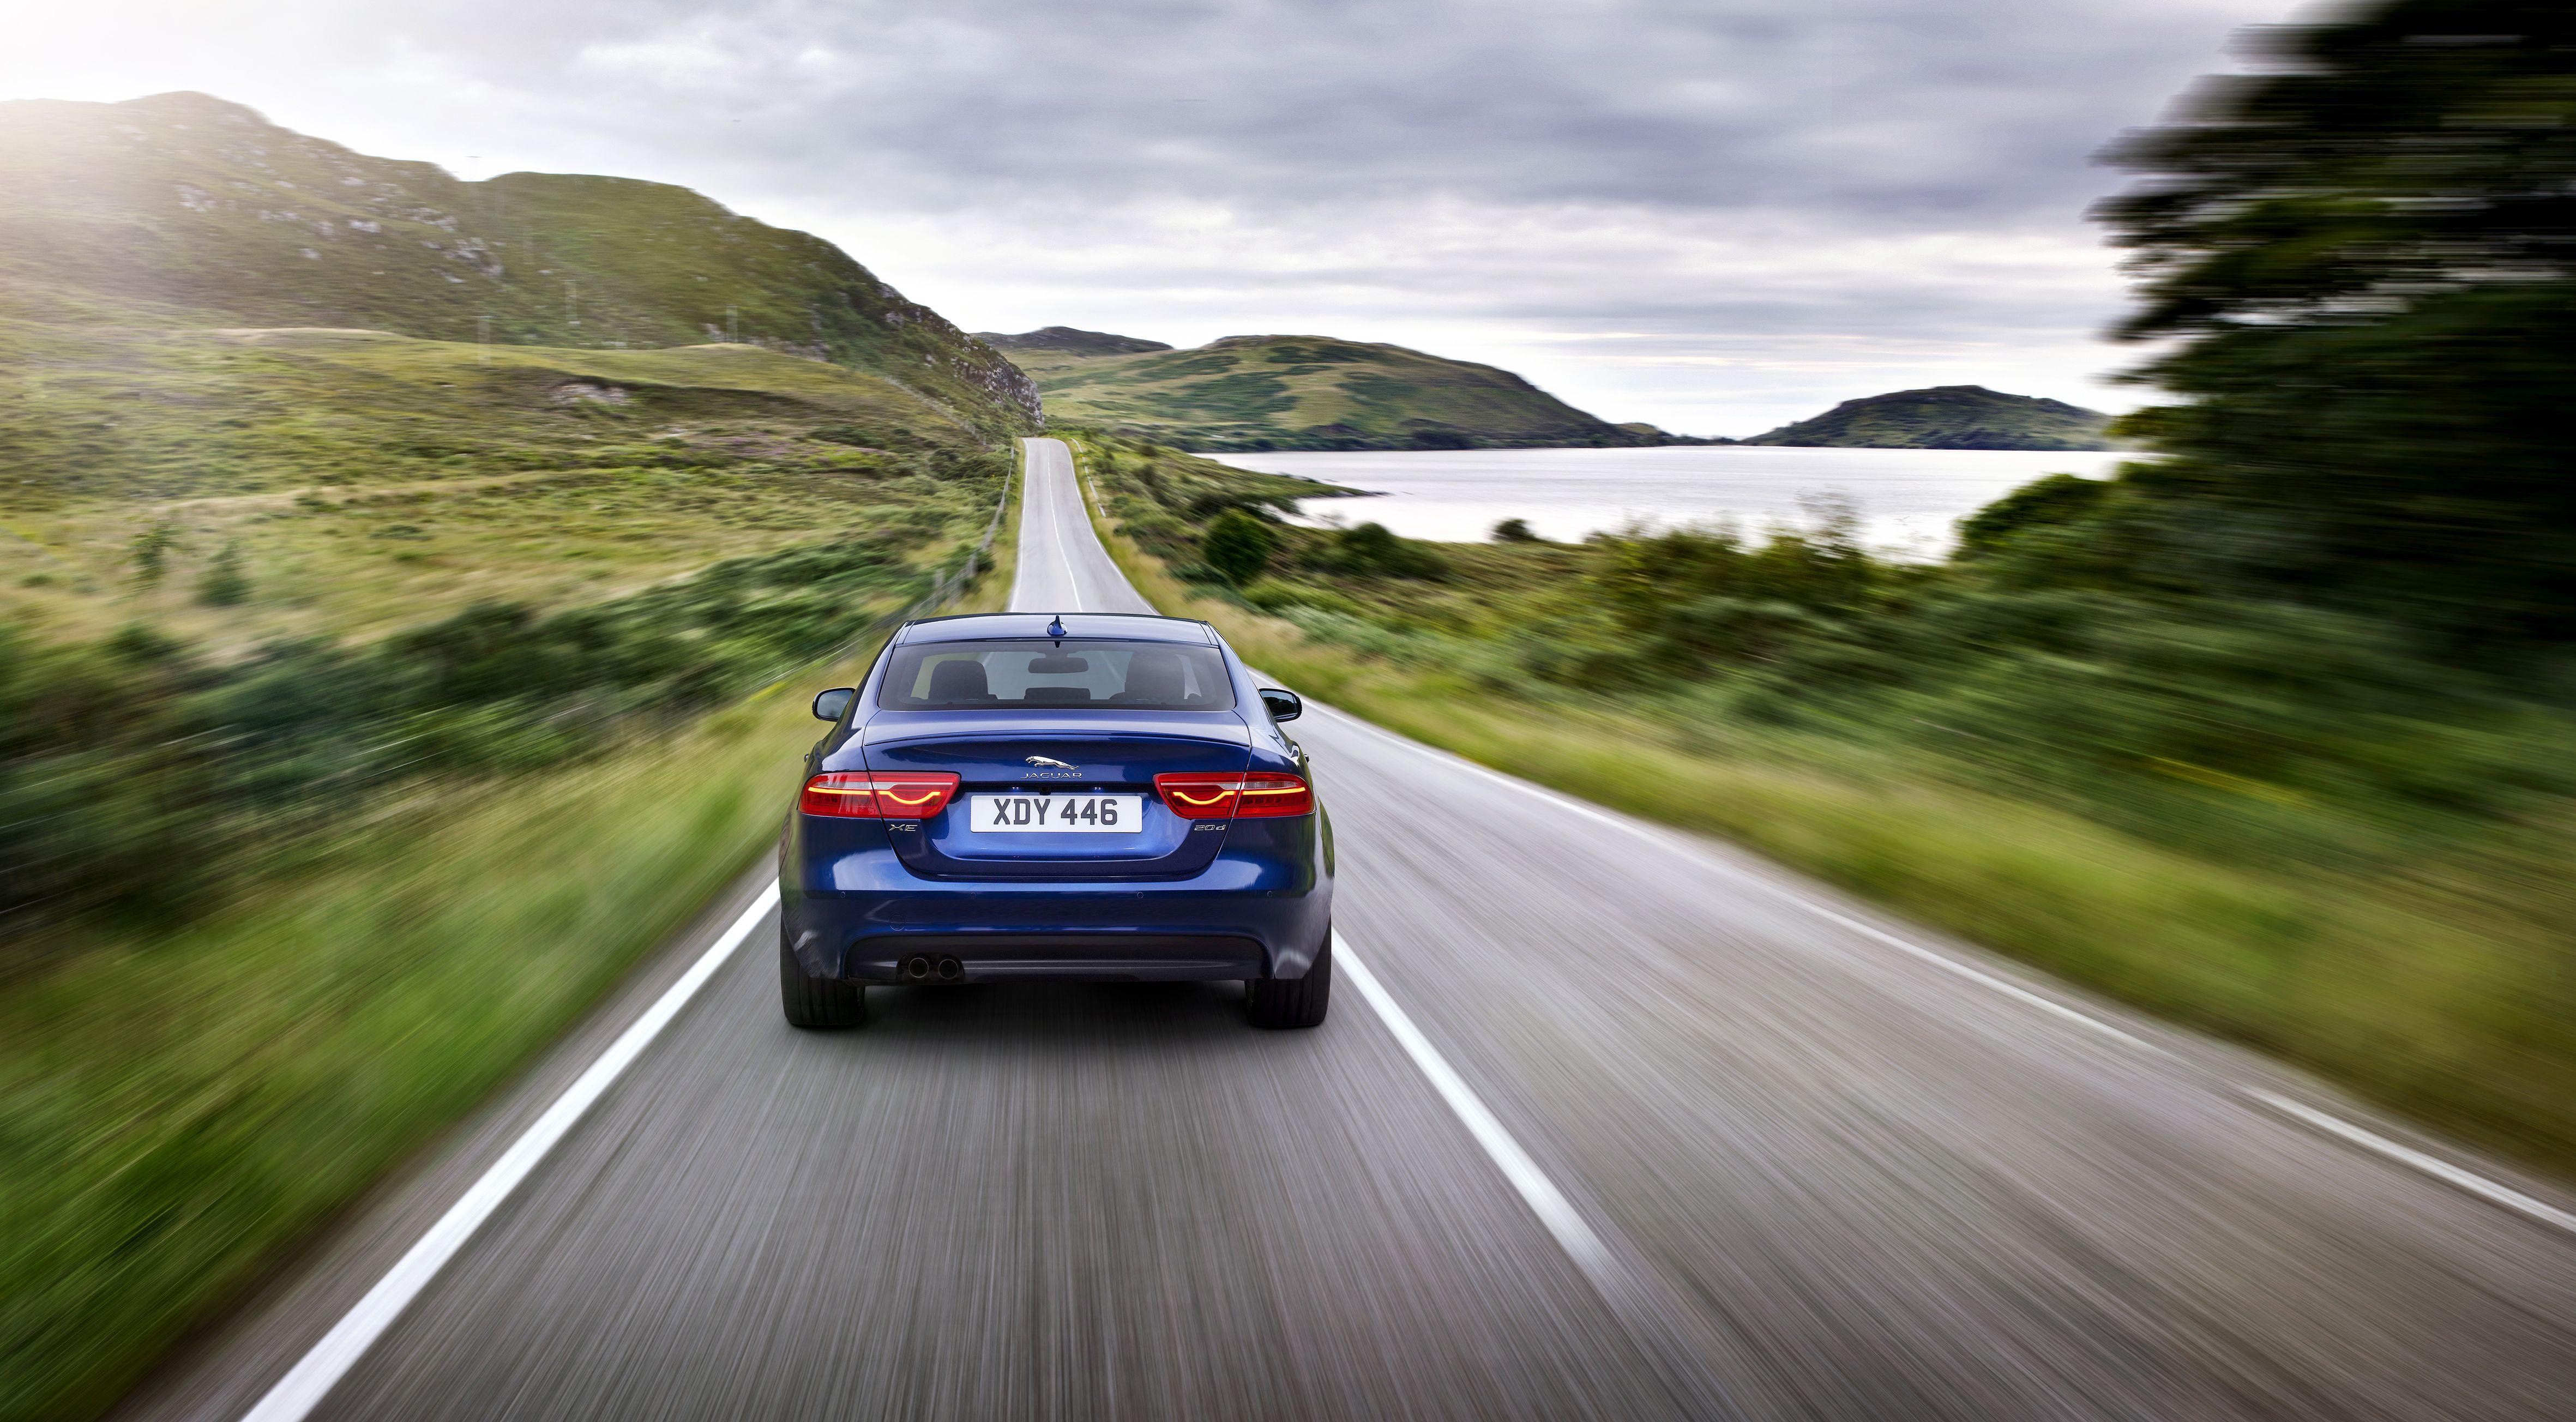 Wallpapers Jaguar S Type Sports Car Road Personal Luxury Car Sportscar Fotografii Galereya